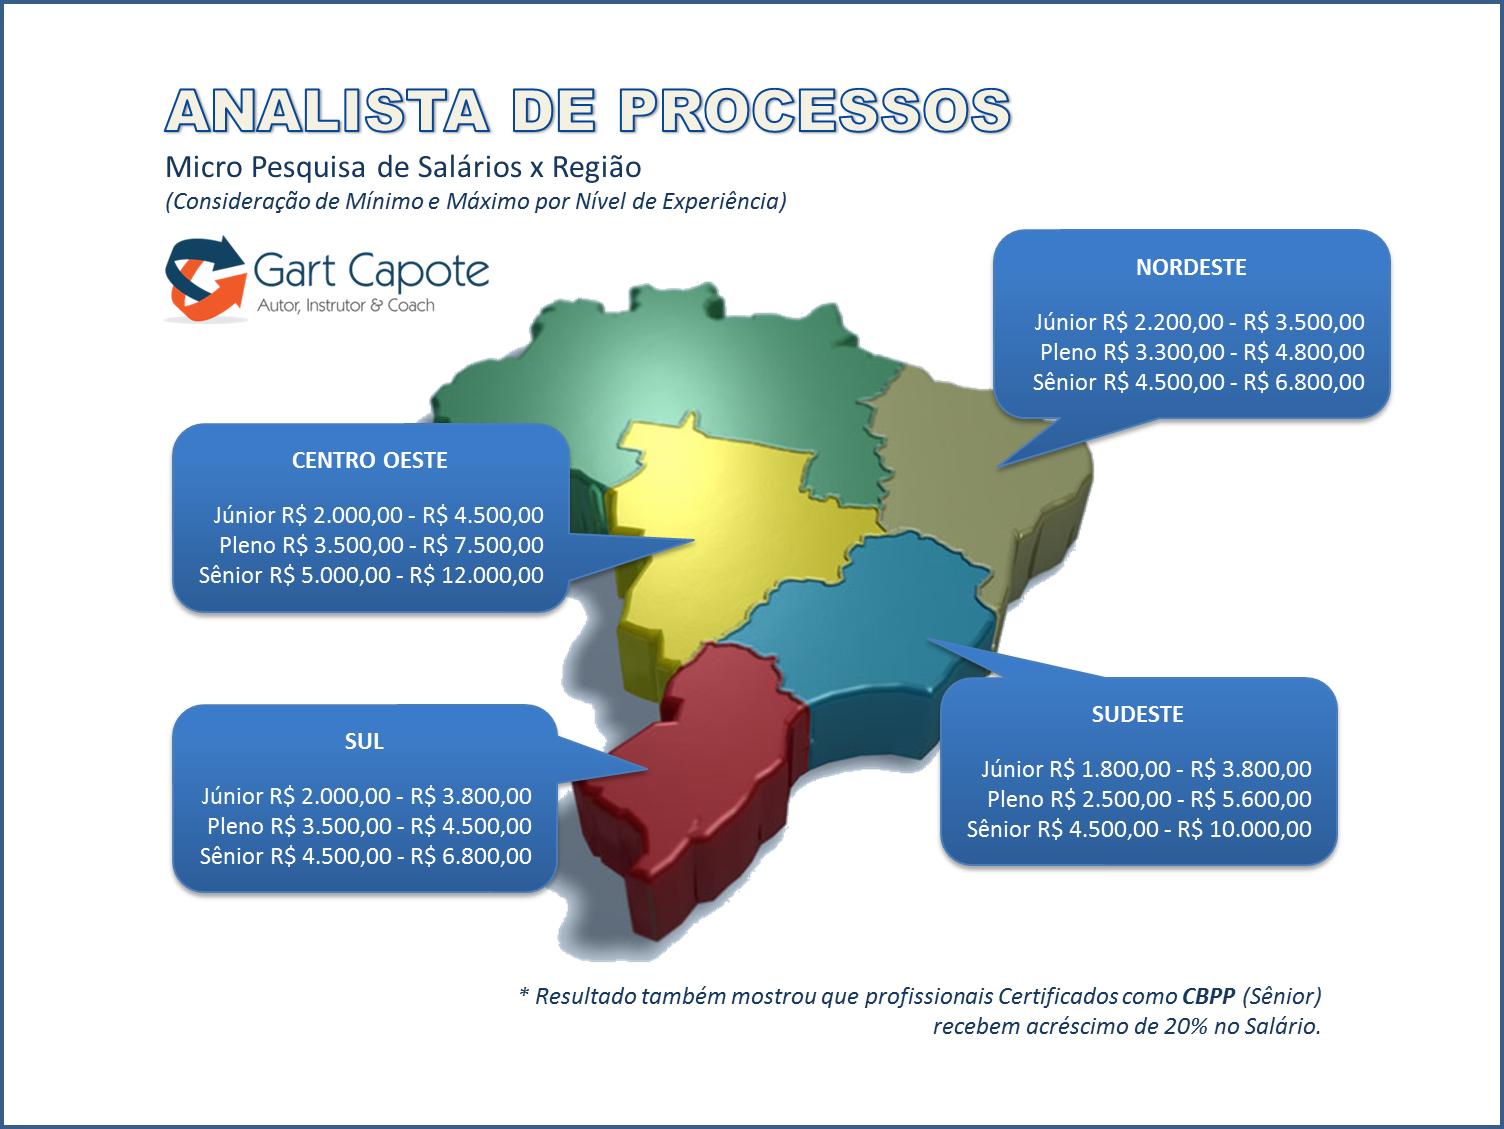 Gart Capote & Mundo BPM: Analista de Processos - Pesquisa